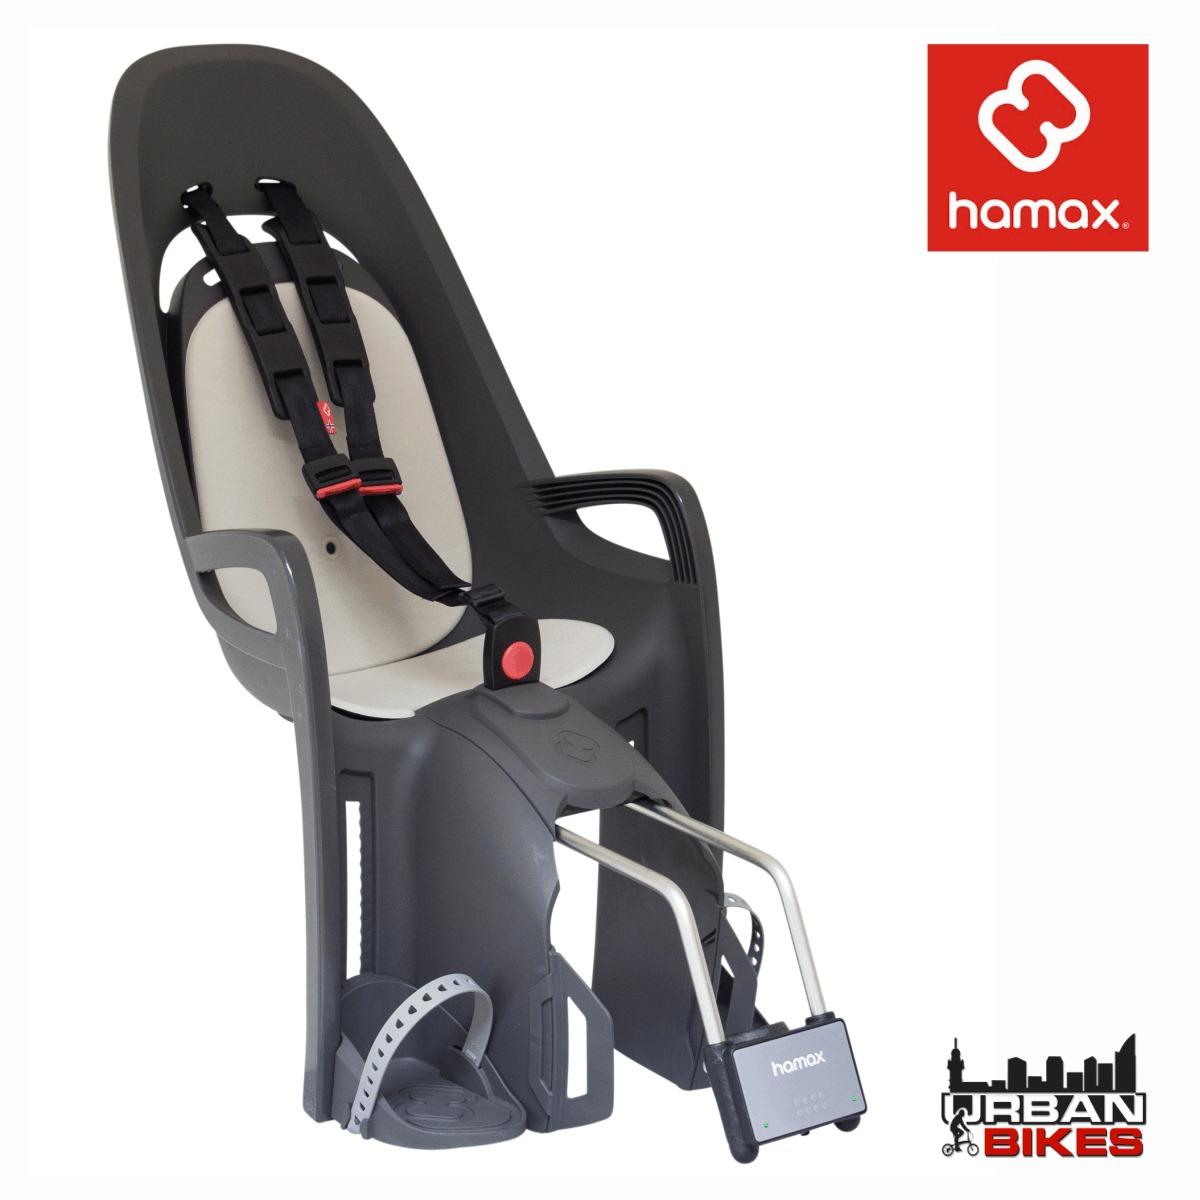 Silla Infantil Bicicleta Hamax Zenith Fabricada En Noruega  US 18800 en Mercado Libre